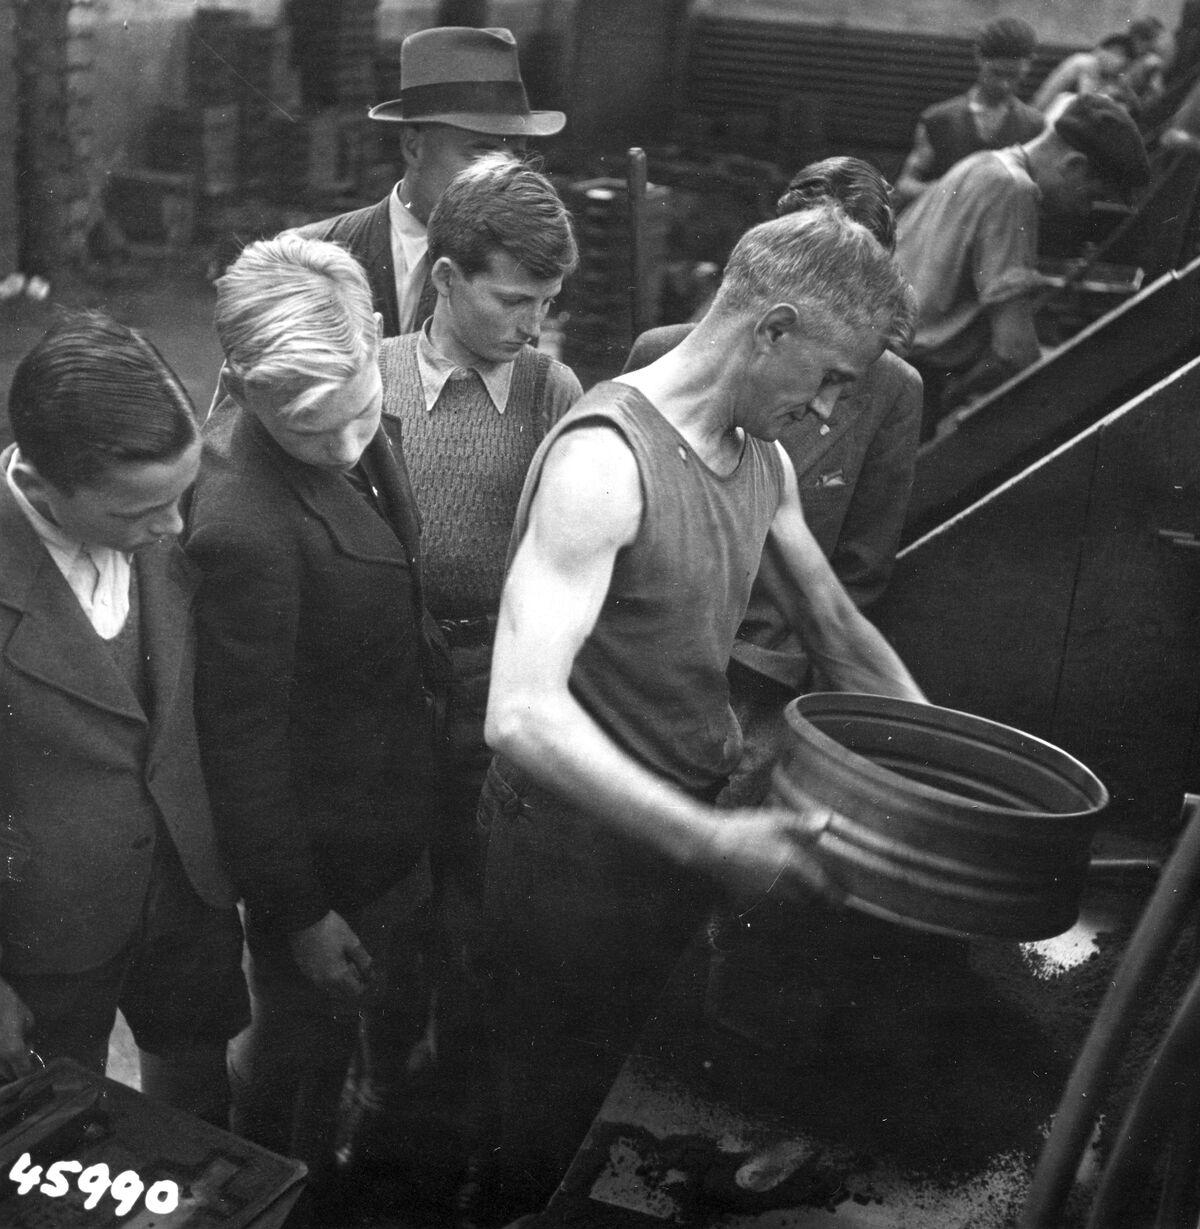 GFA 12/45990: Reportage casting process in malleable casting